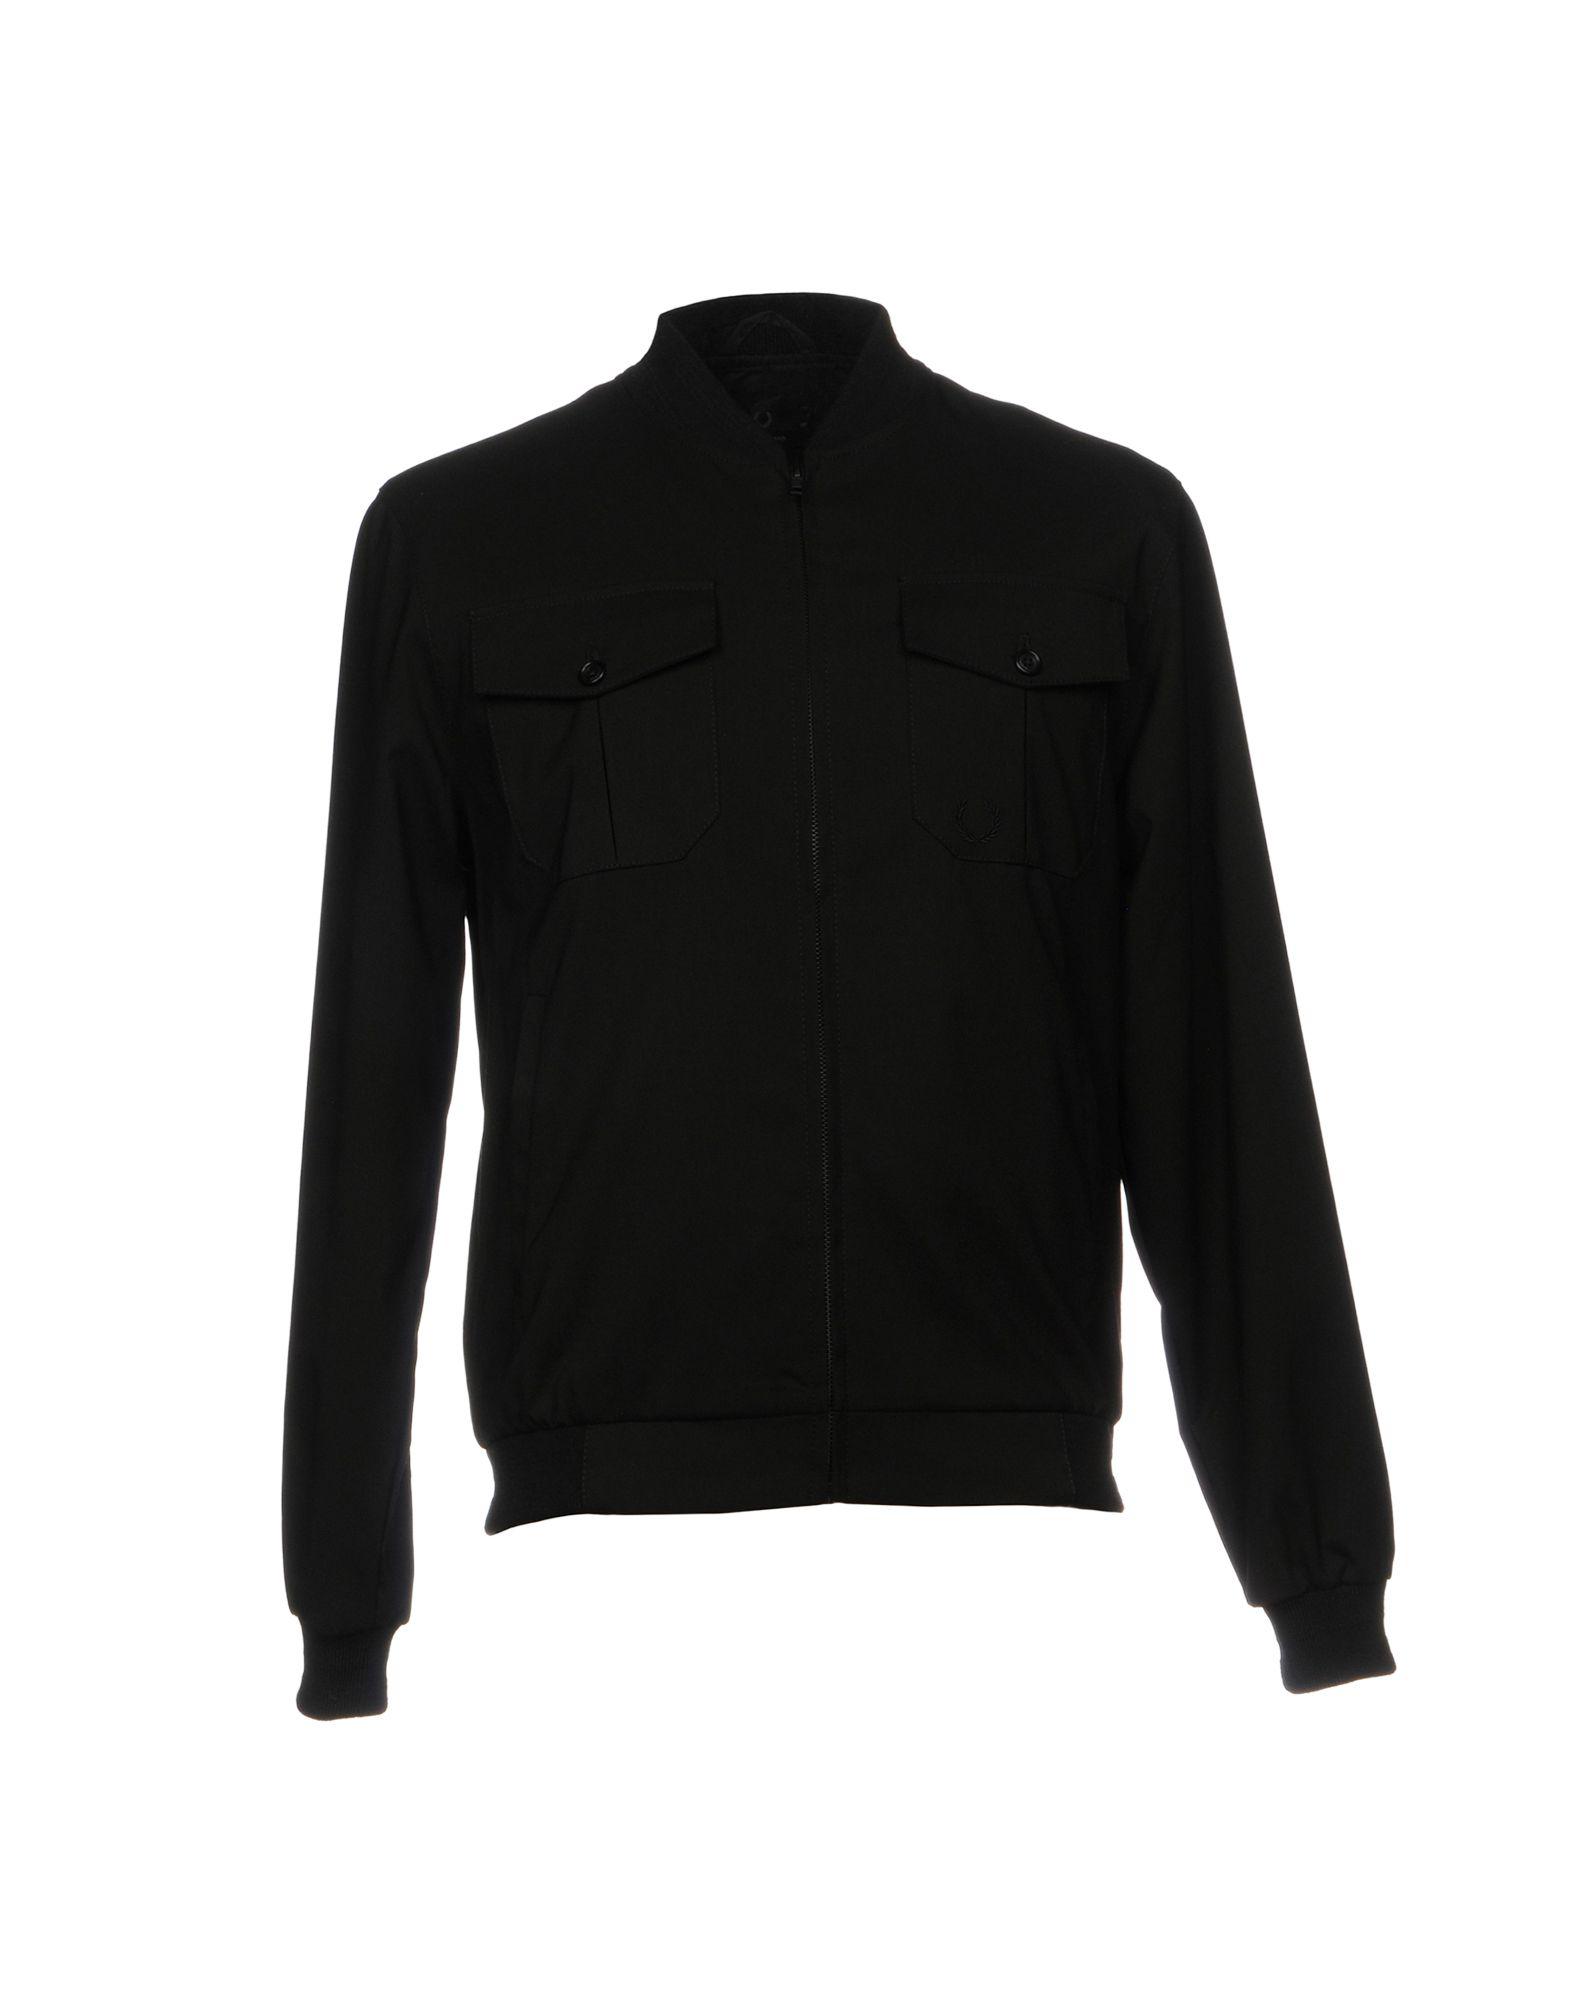 цены на FRED PERRY Куртка в интернет-магазинах